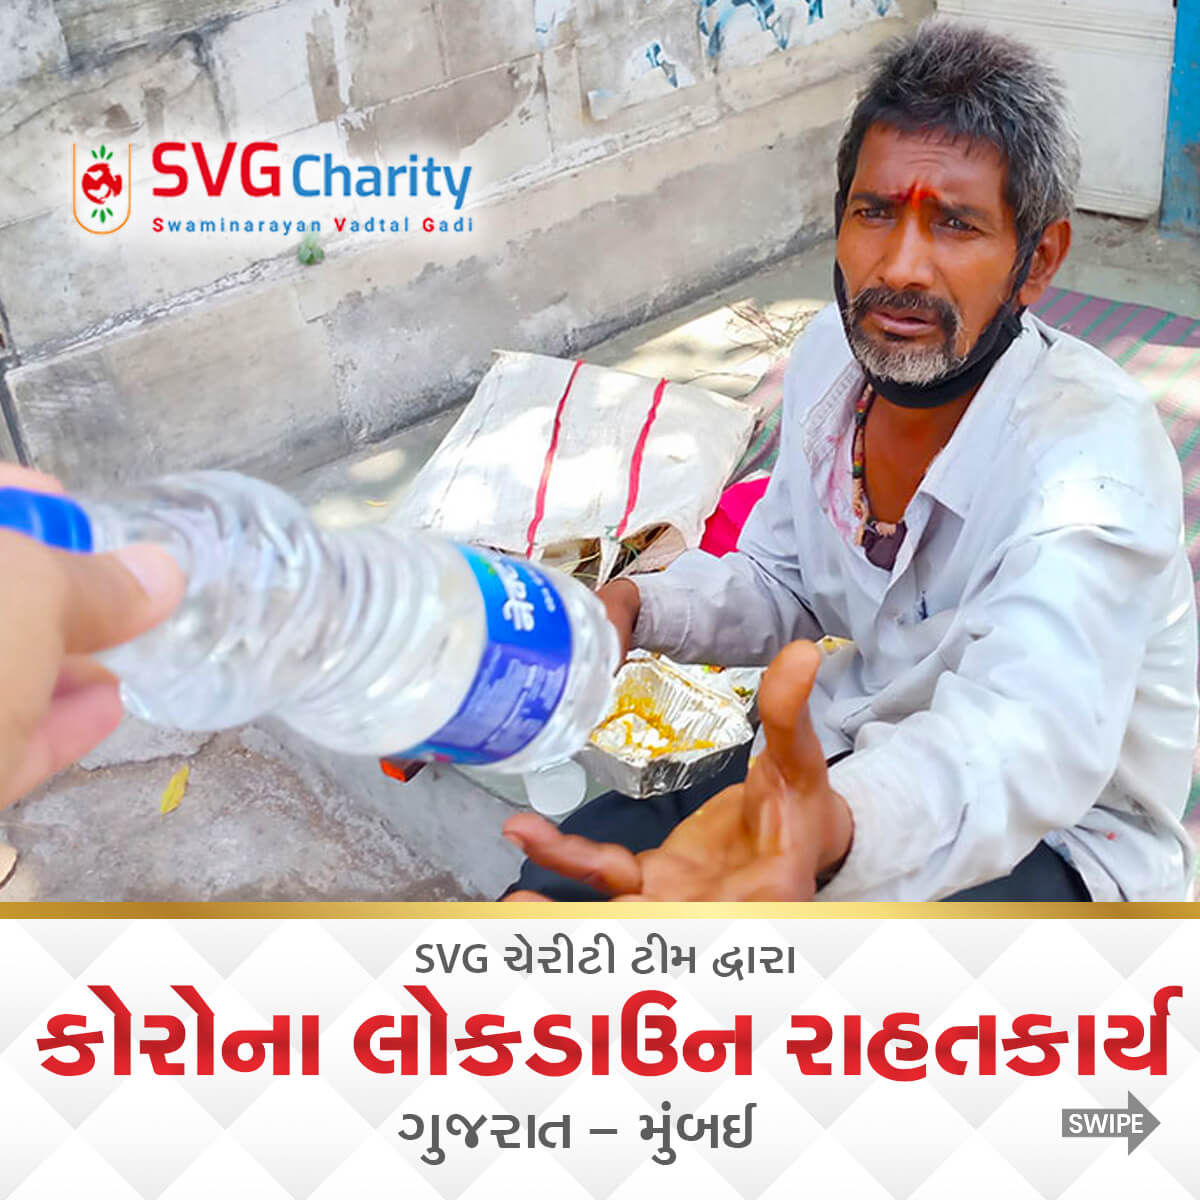 SVG Charity : Corona (COVID-19) Relief Work